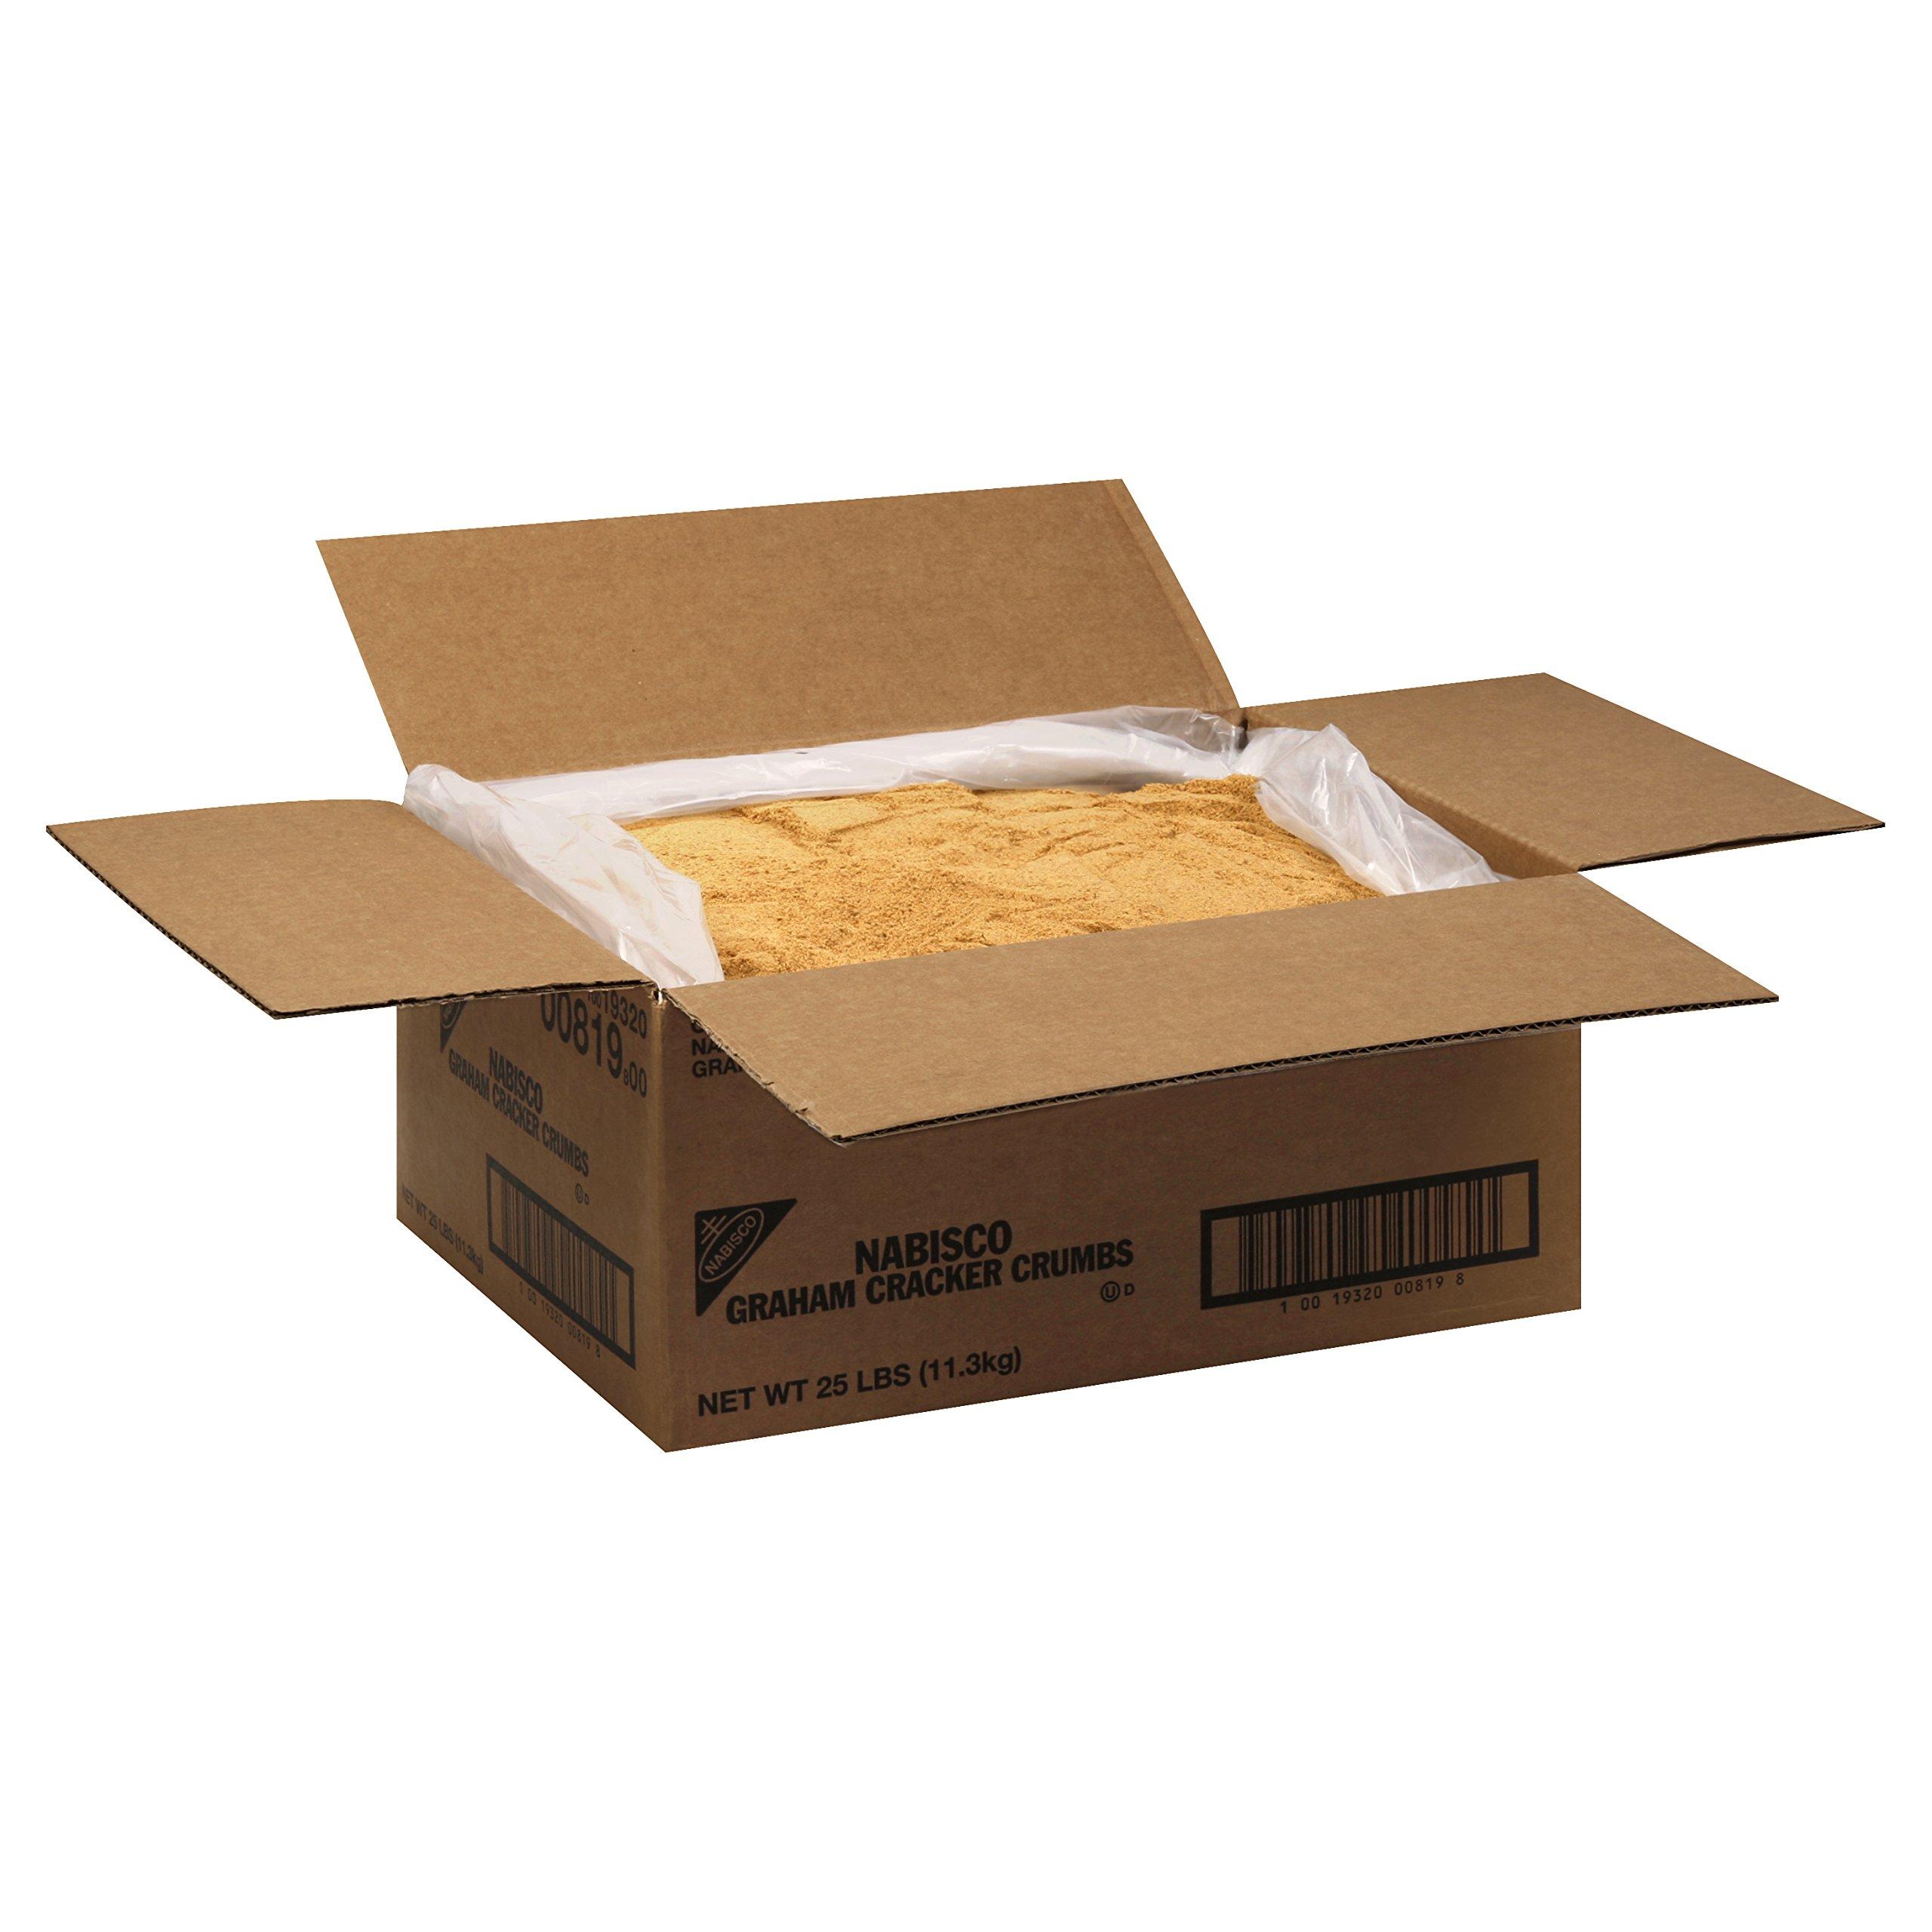 Nabisco Graham Crackers Crumbs, 25 lb Box by Nabisco